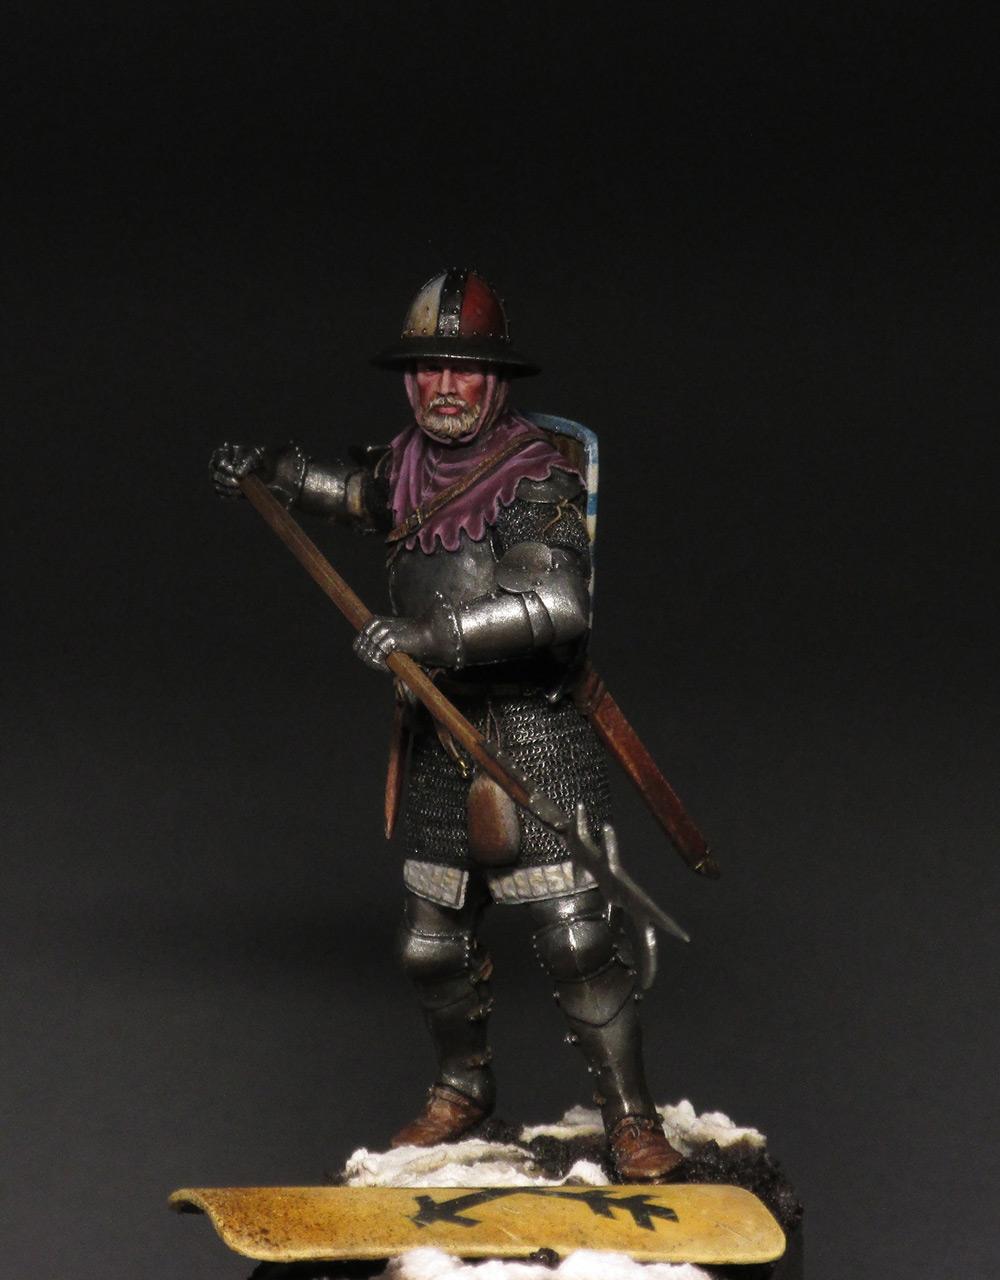 Figures: Medieval infantryman, photo #10